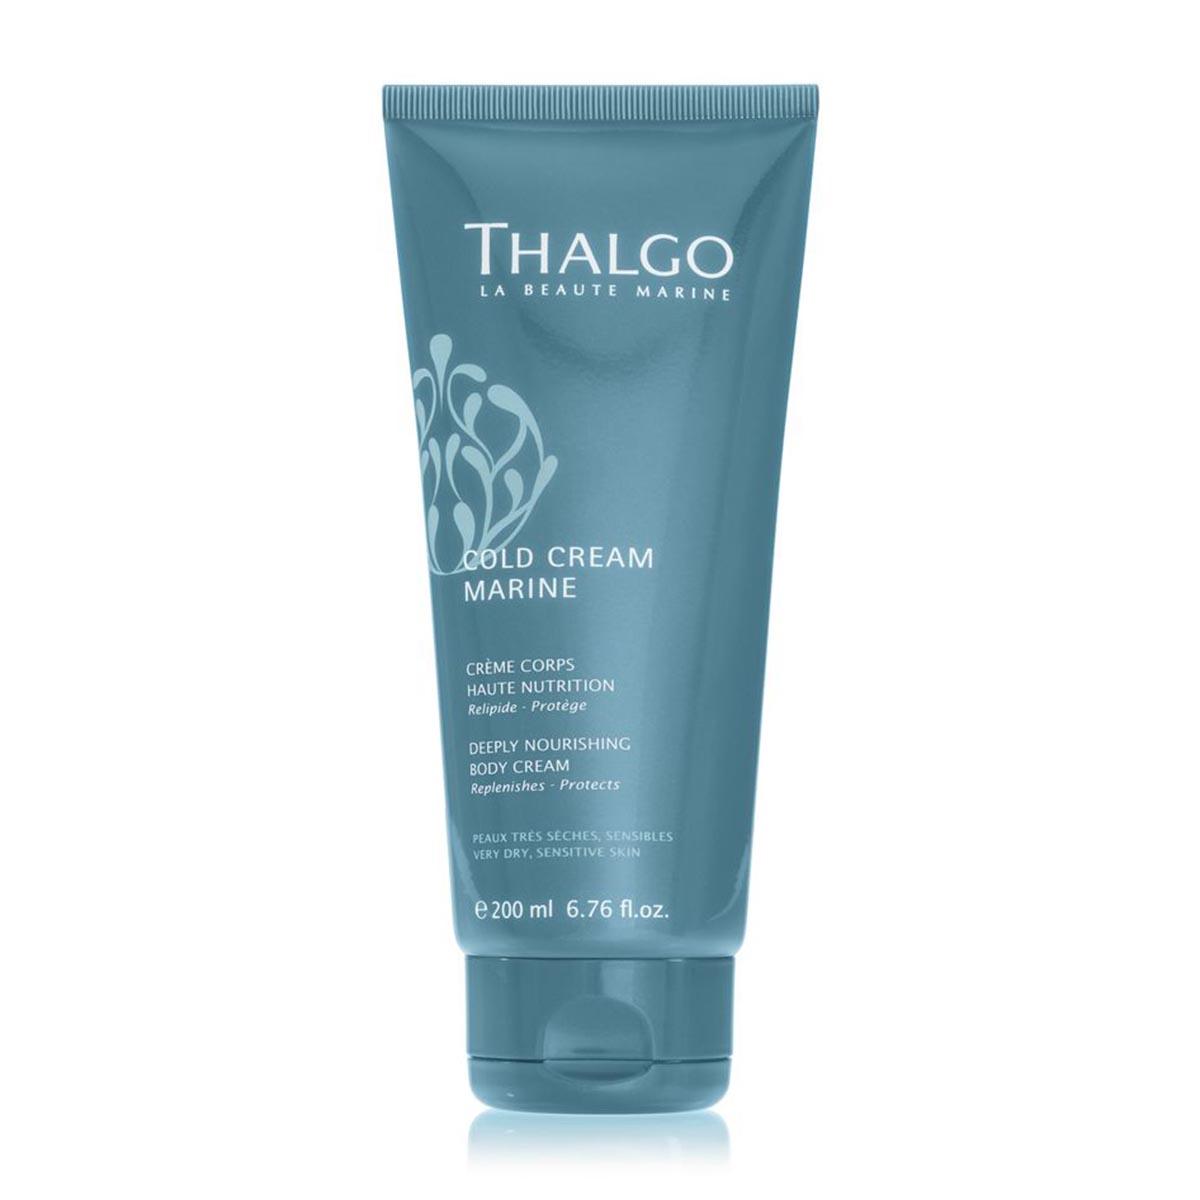 Thalgo cold cream marine 24 hydrating body milk dry sensitive skin 200ml